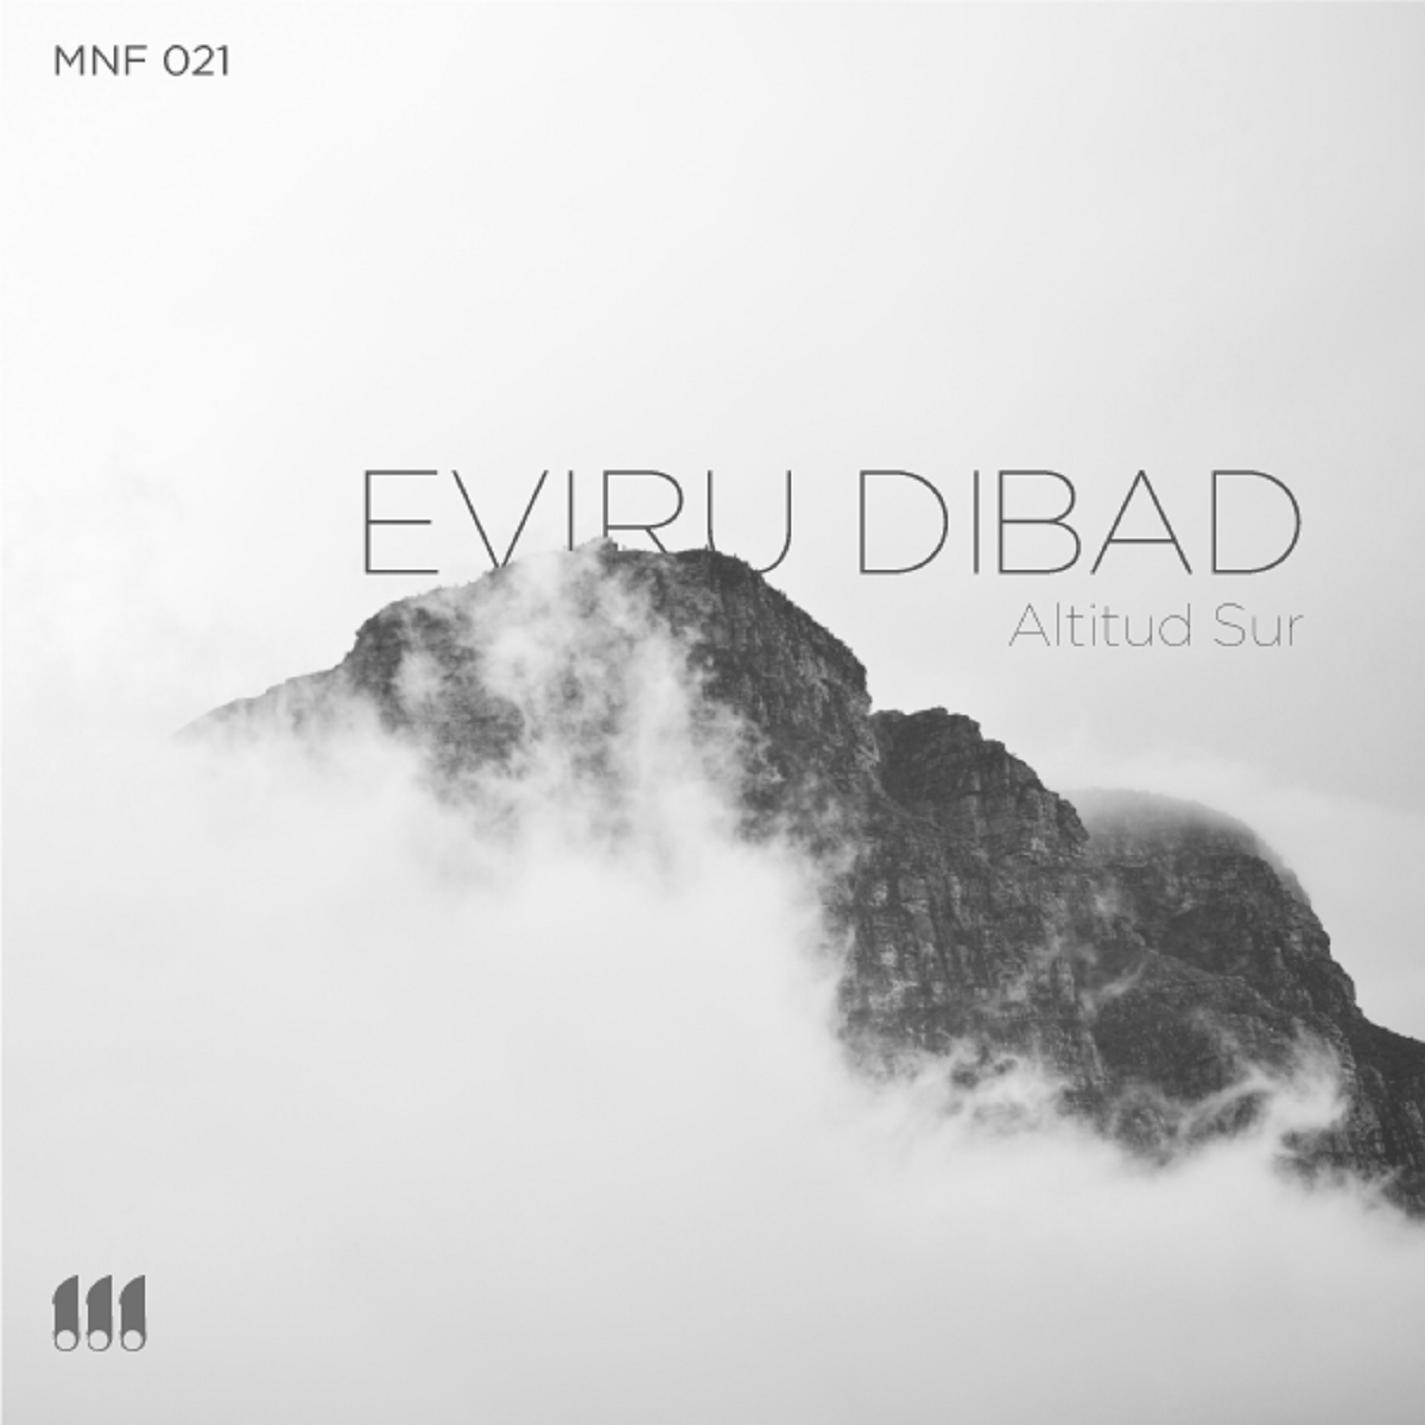 Monofonicos presenta nuevo disco - [MNF 021] Eviru Dibad - Altitud Sur